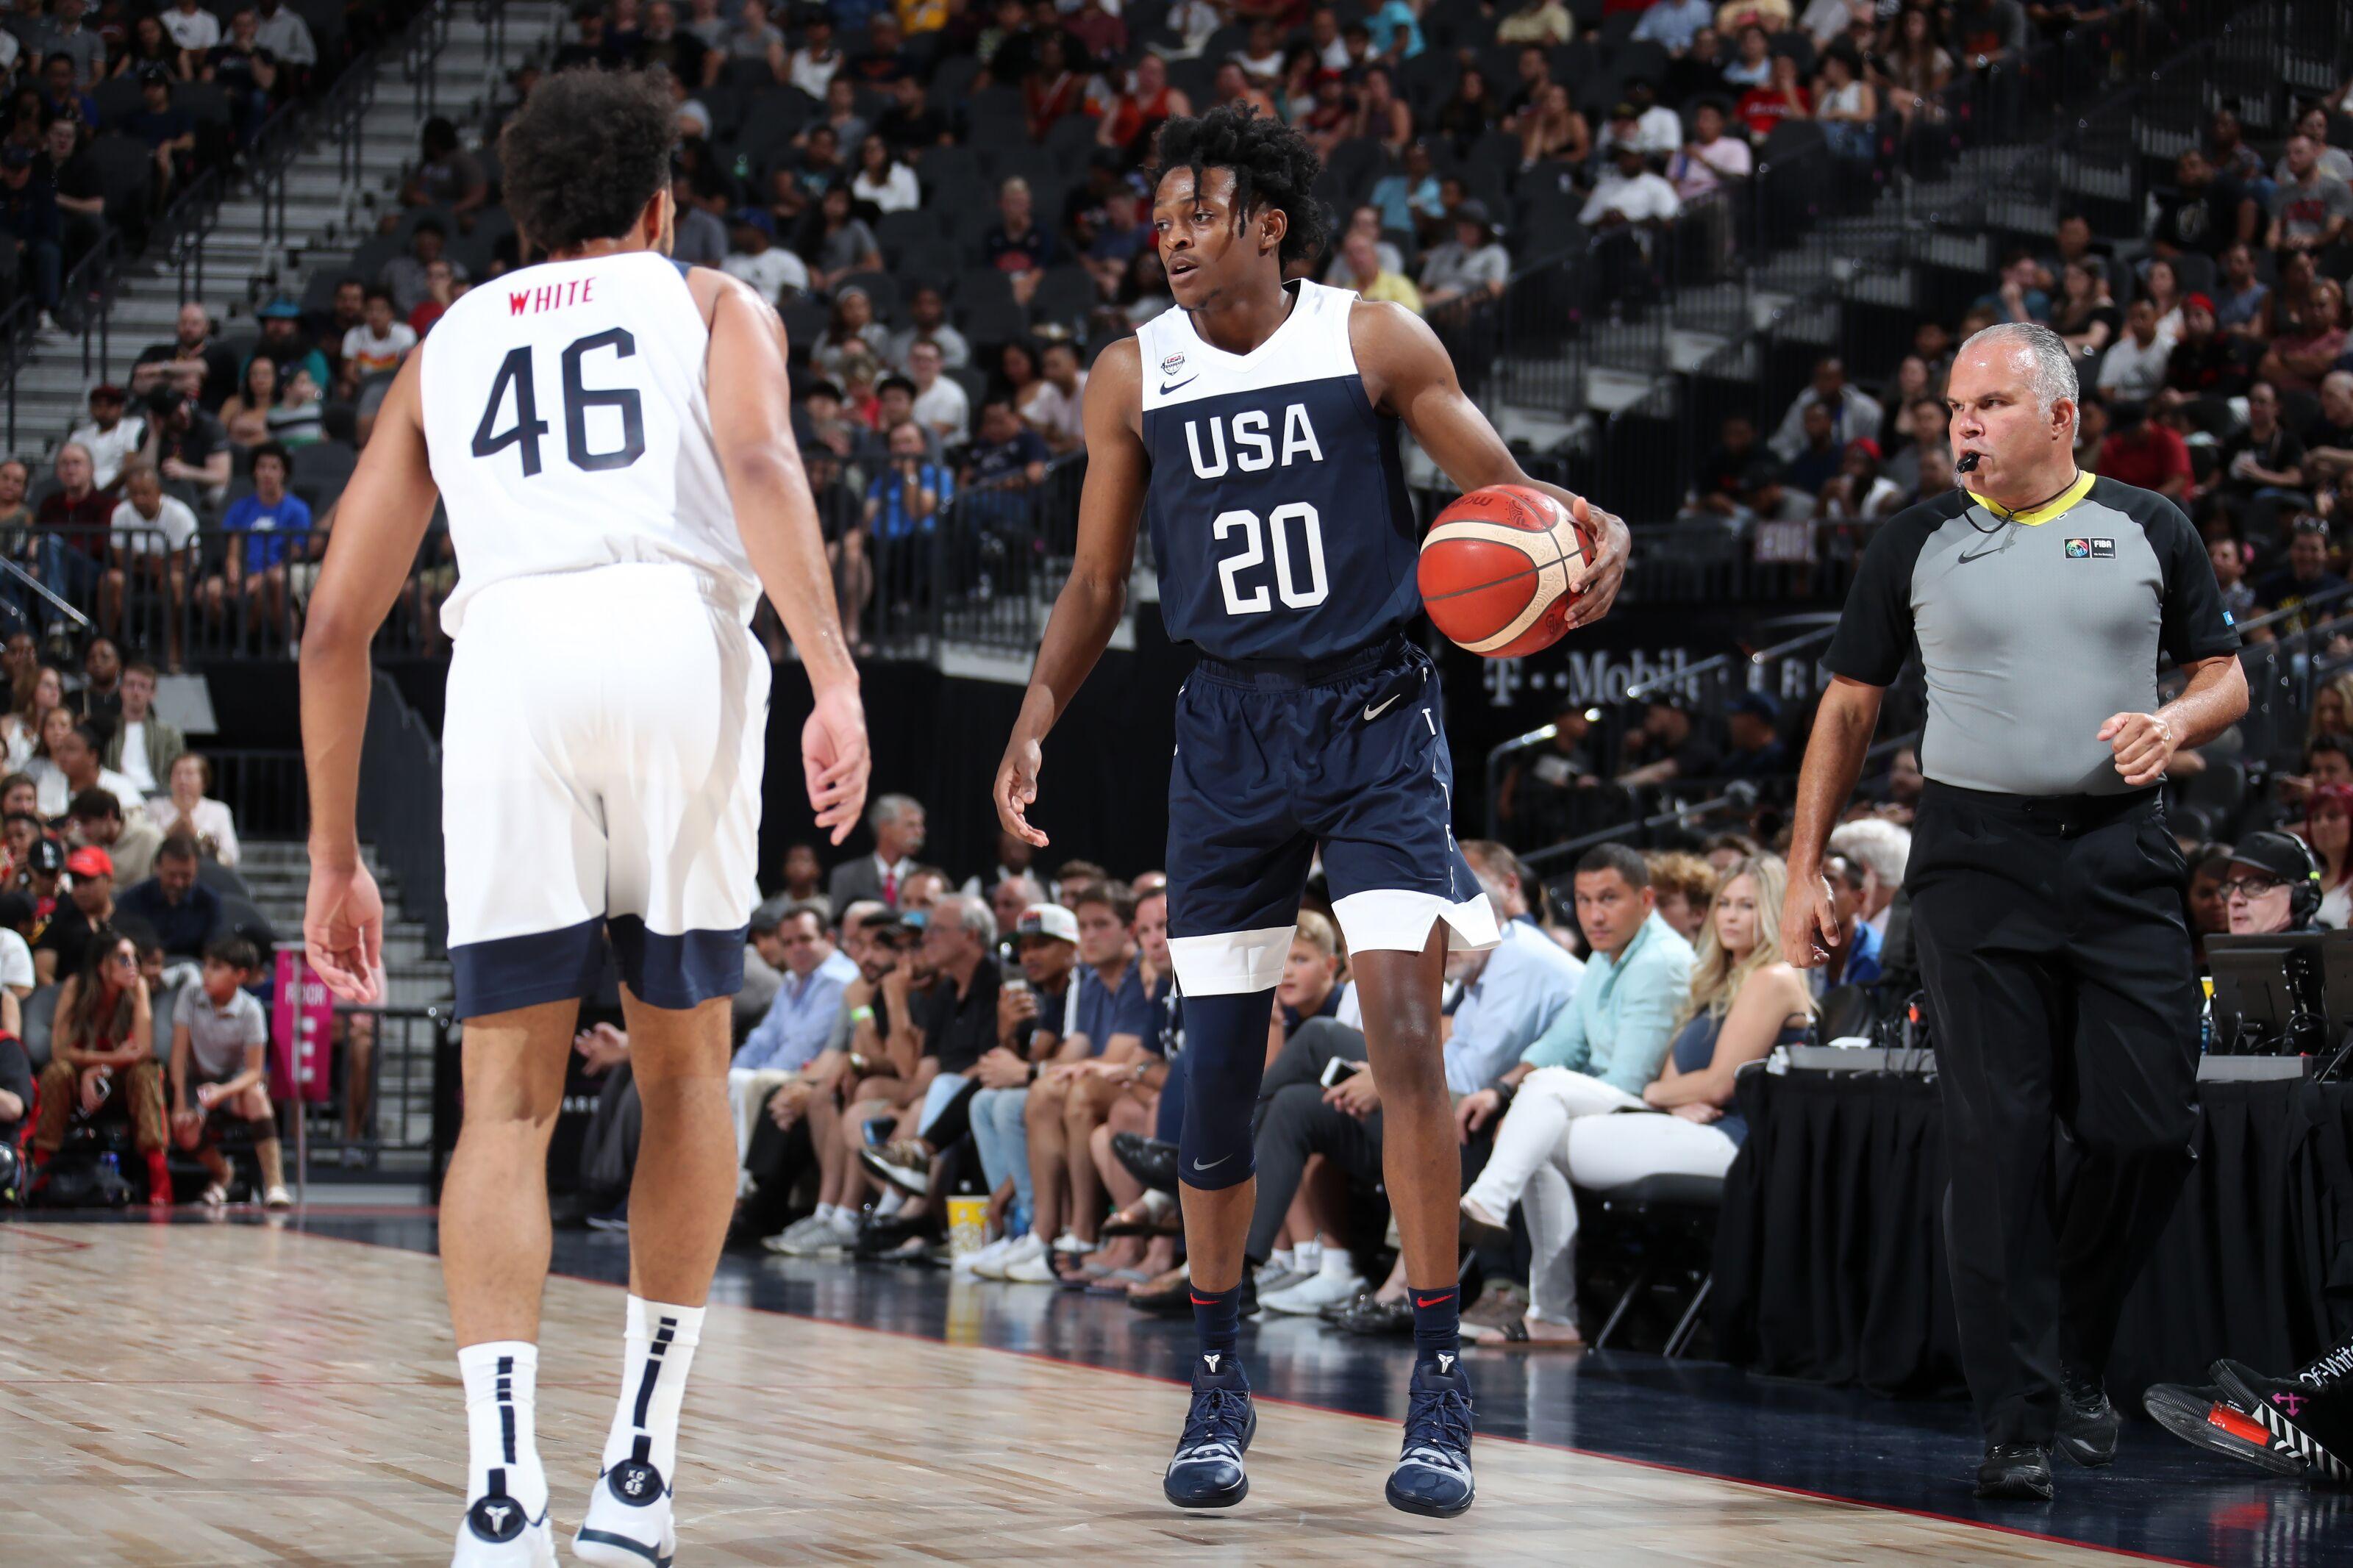 USA Basketball: 1 cut remains after De'Aaron Fox departure